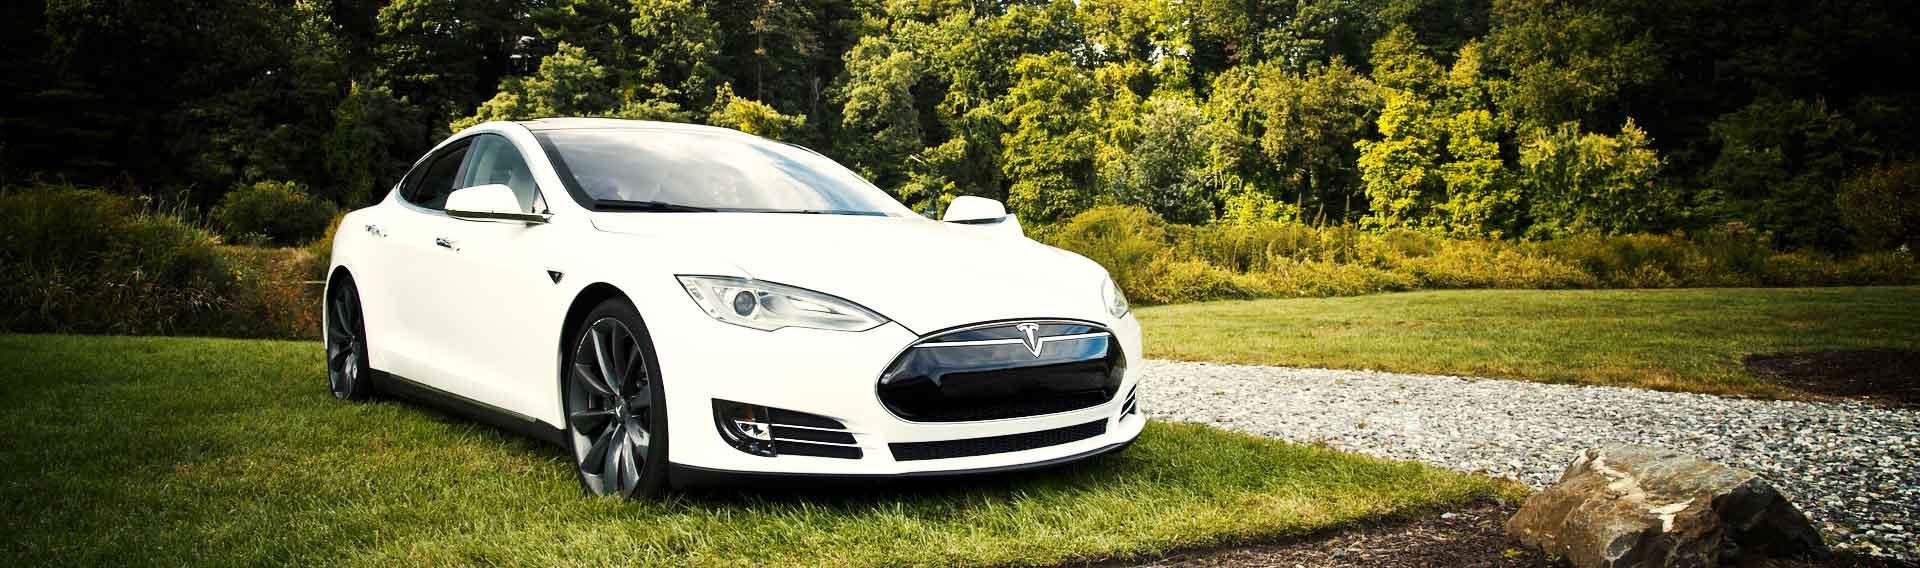 Autonomní vozidlo a BOZP